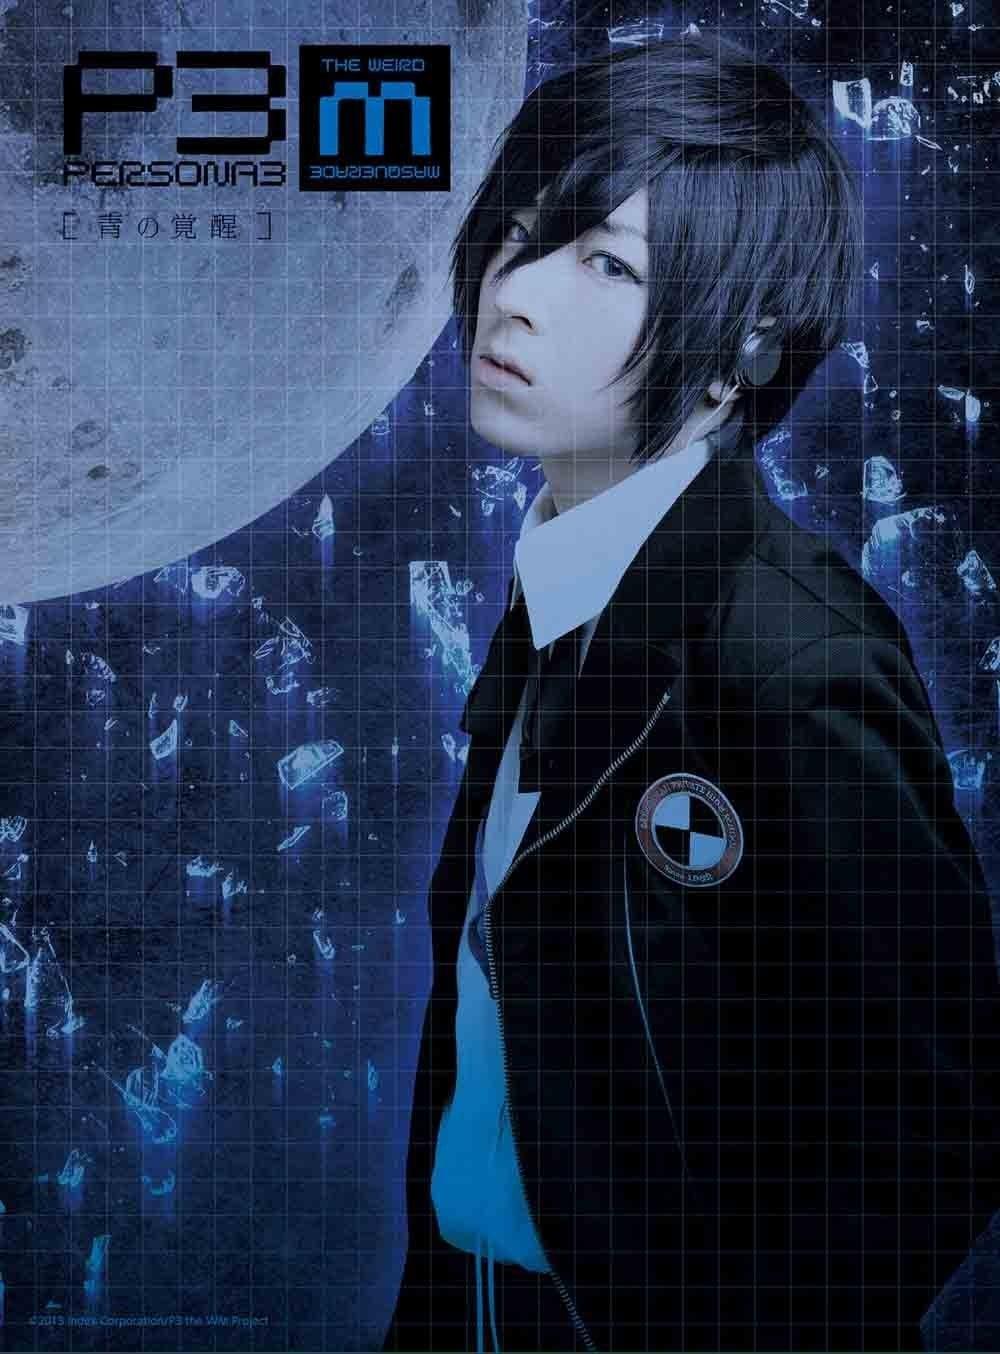 PERSONA3 the Weird Masquerade ~The Blue Awakening~